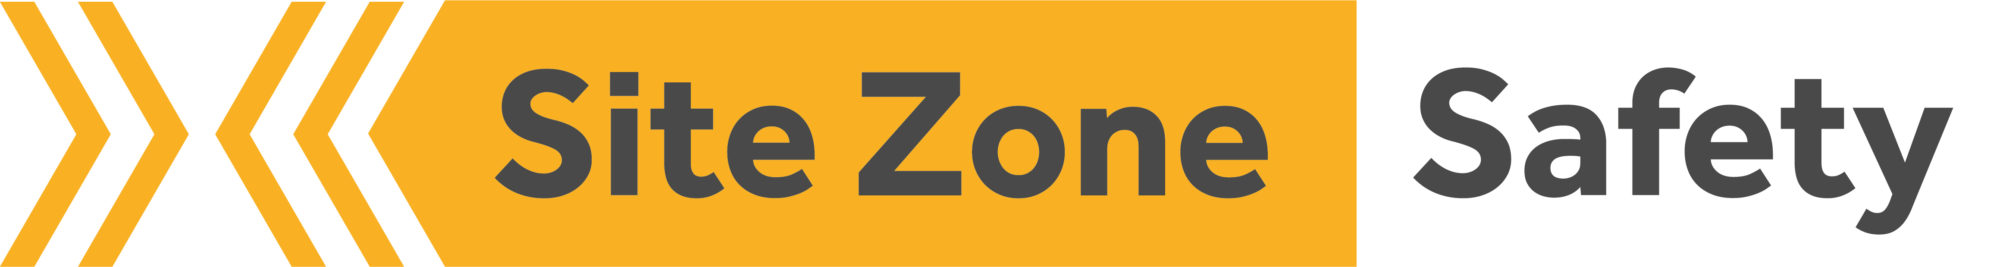 SiteZone Safety